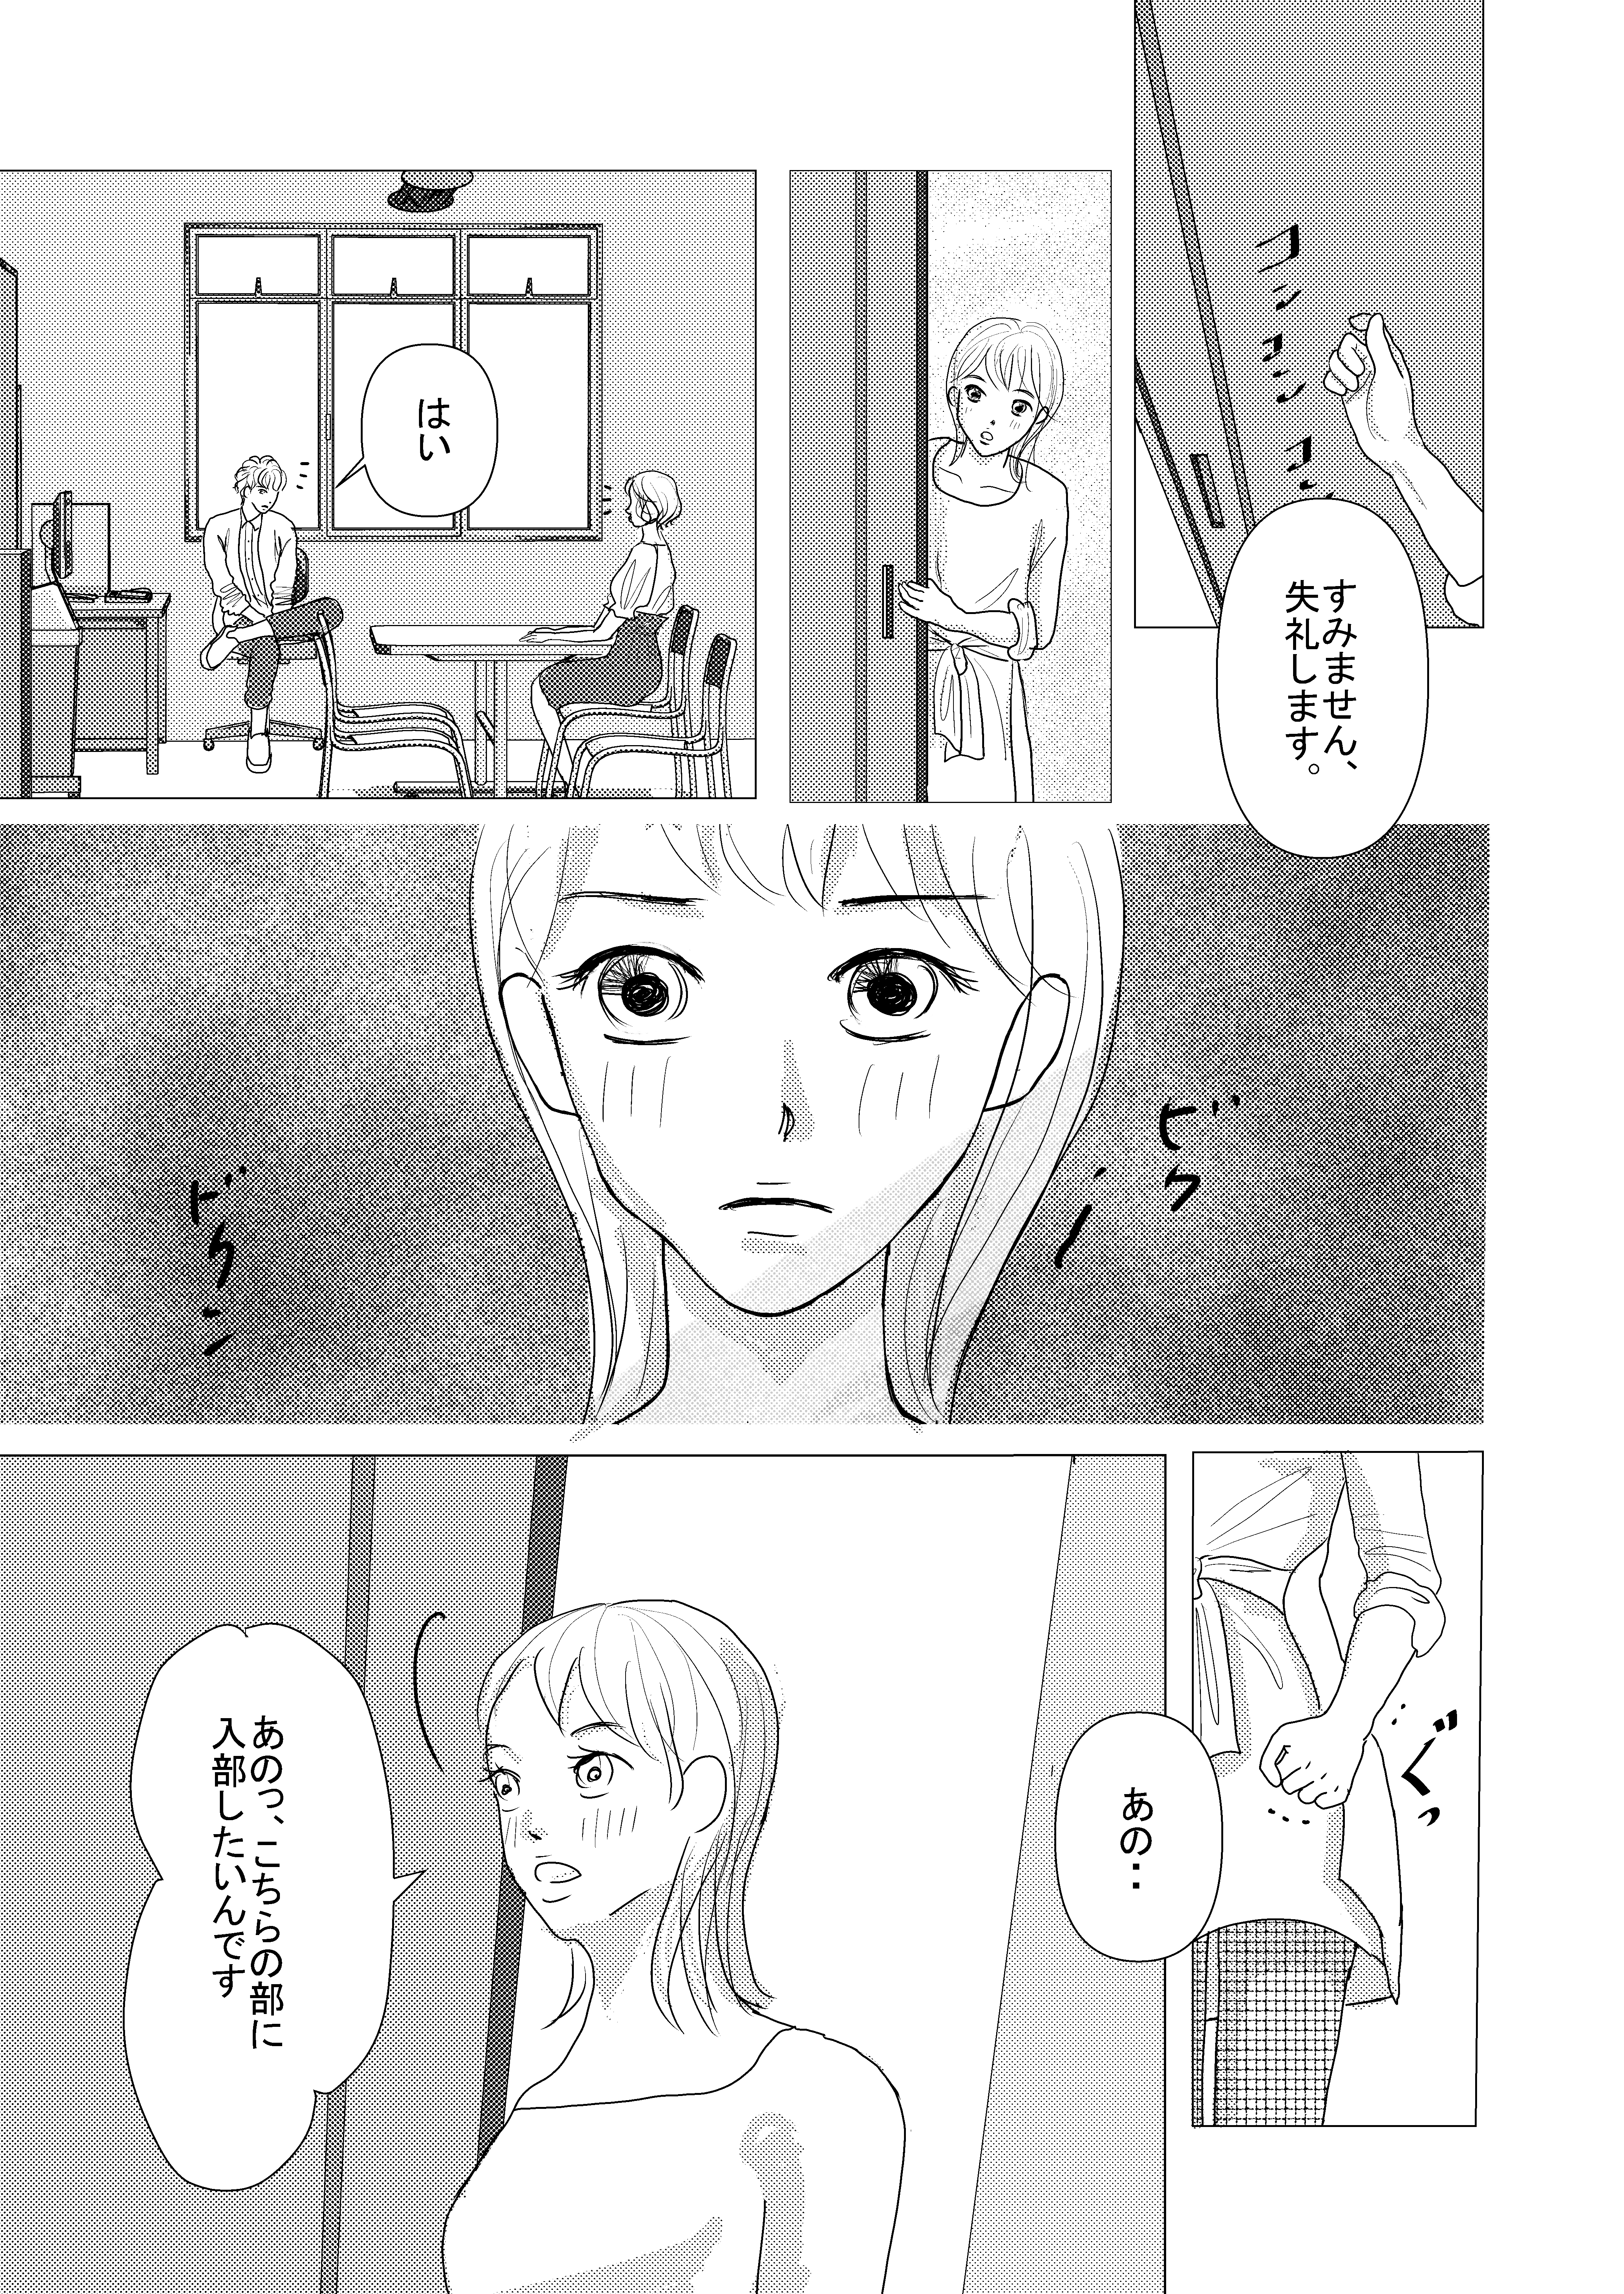 恋愛漫画/大学生/社会人/shoujyo manga/米加夢/27ページ